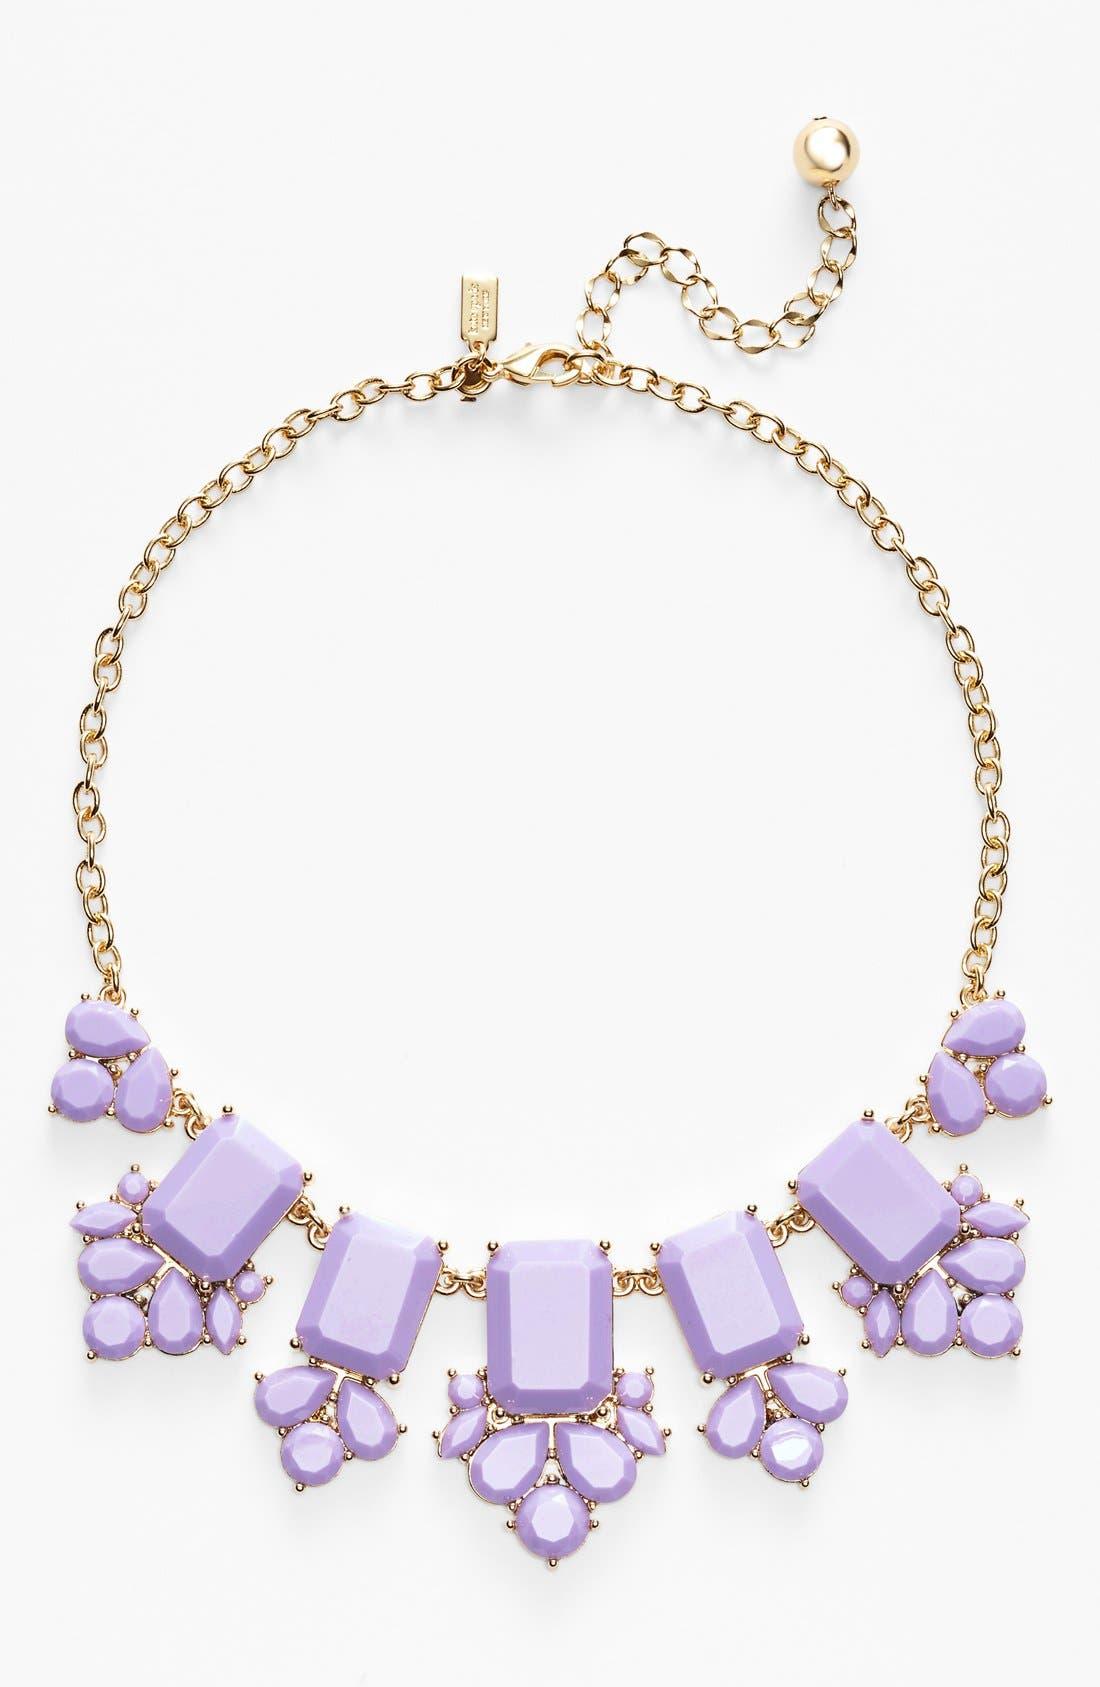 Main Image - kate spade new york 'daylight jewels' statement necklace